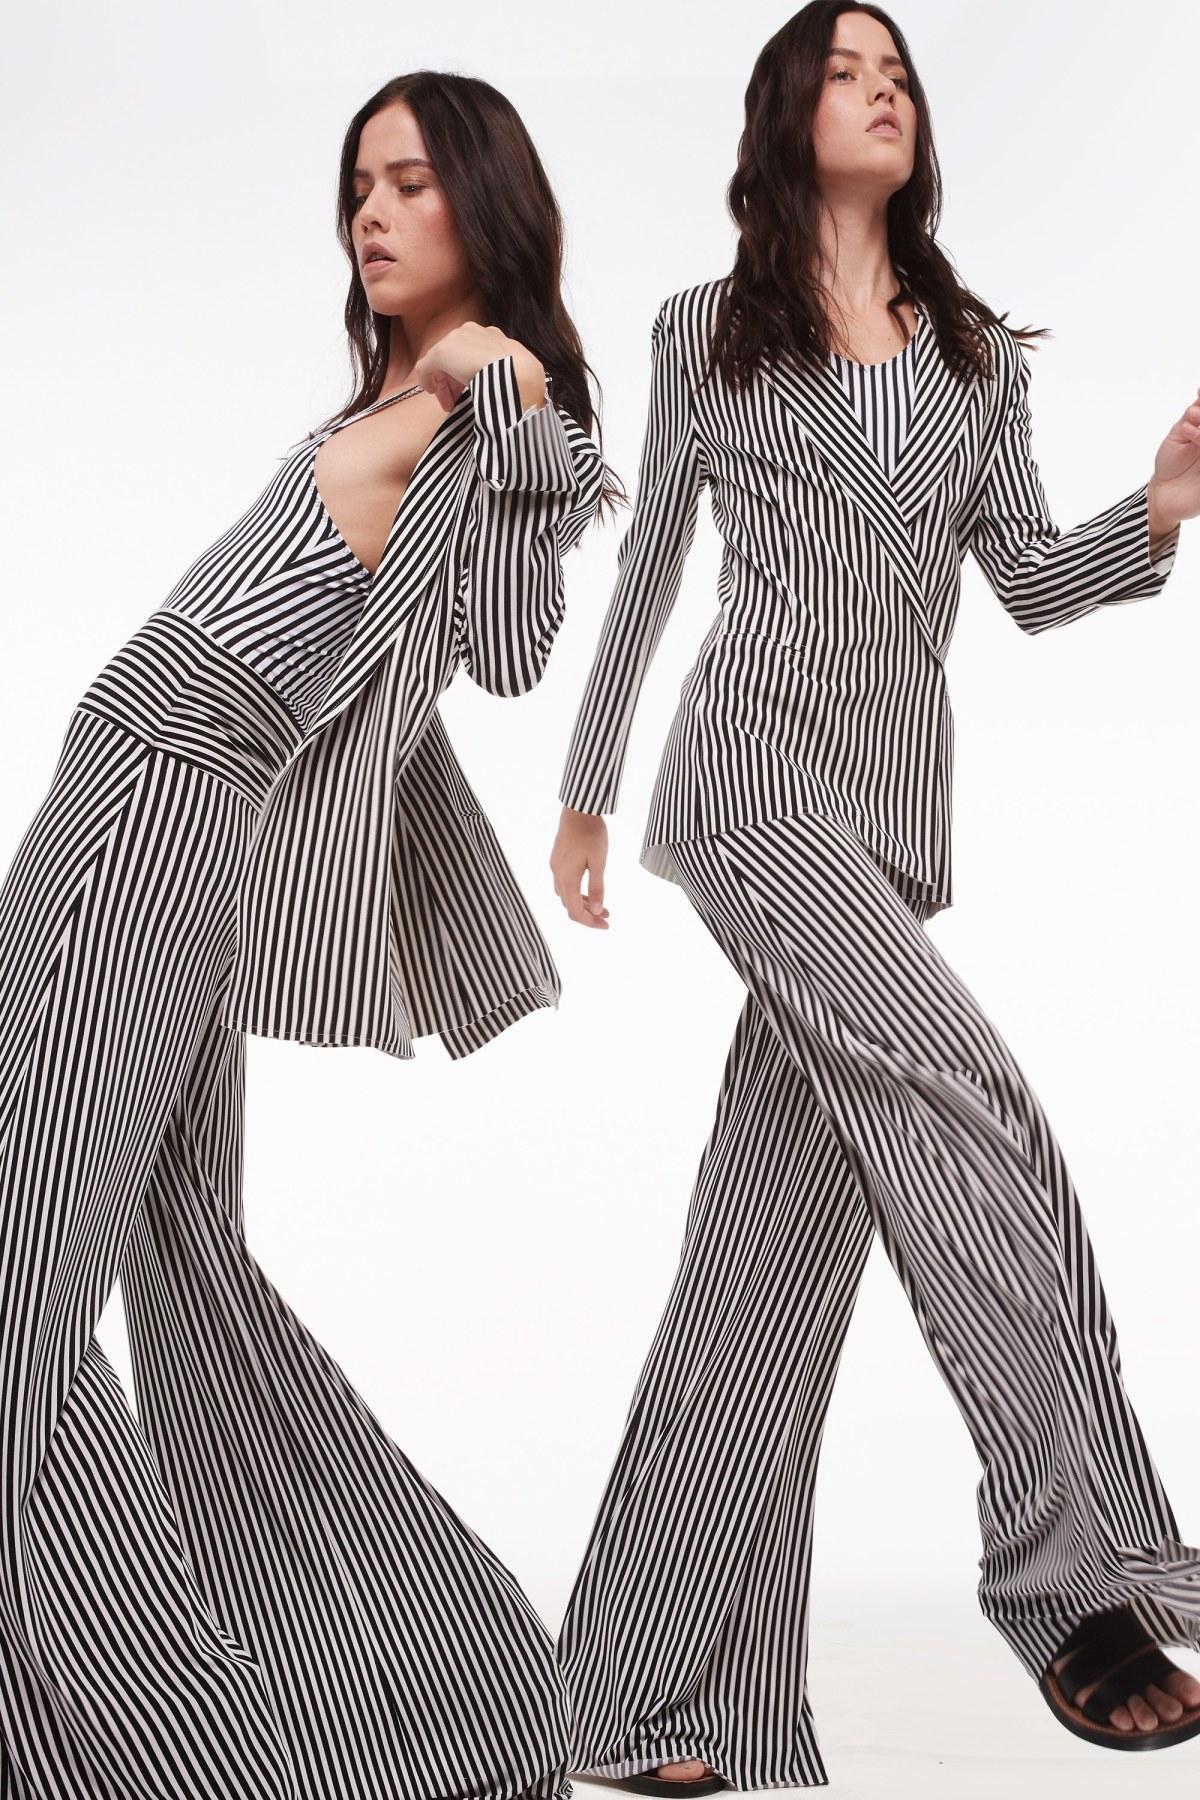 norma-kamali-pre-fall-2017-fashion-show-the-impression-08